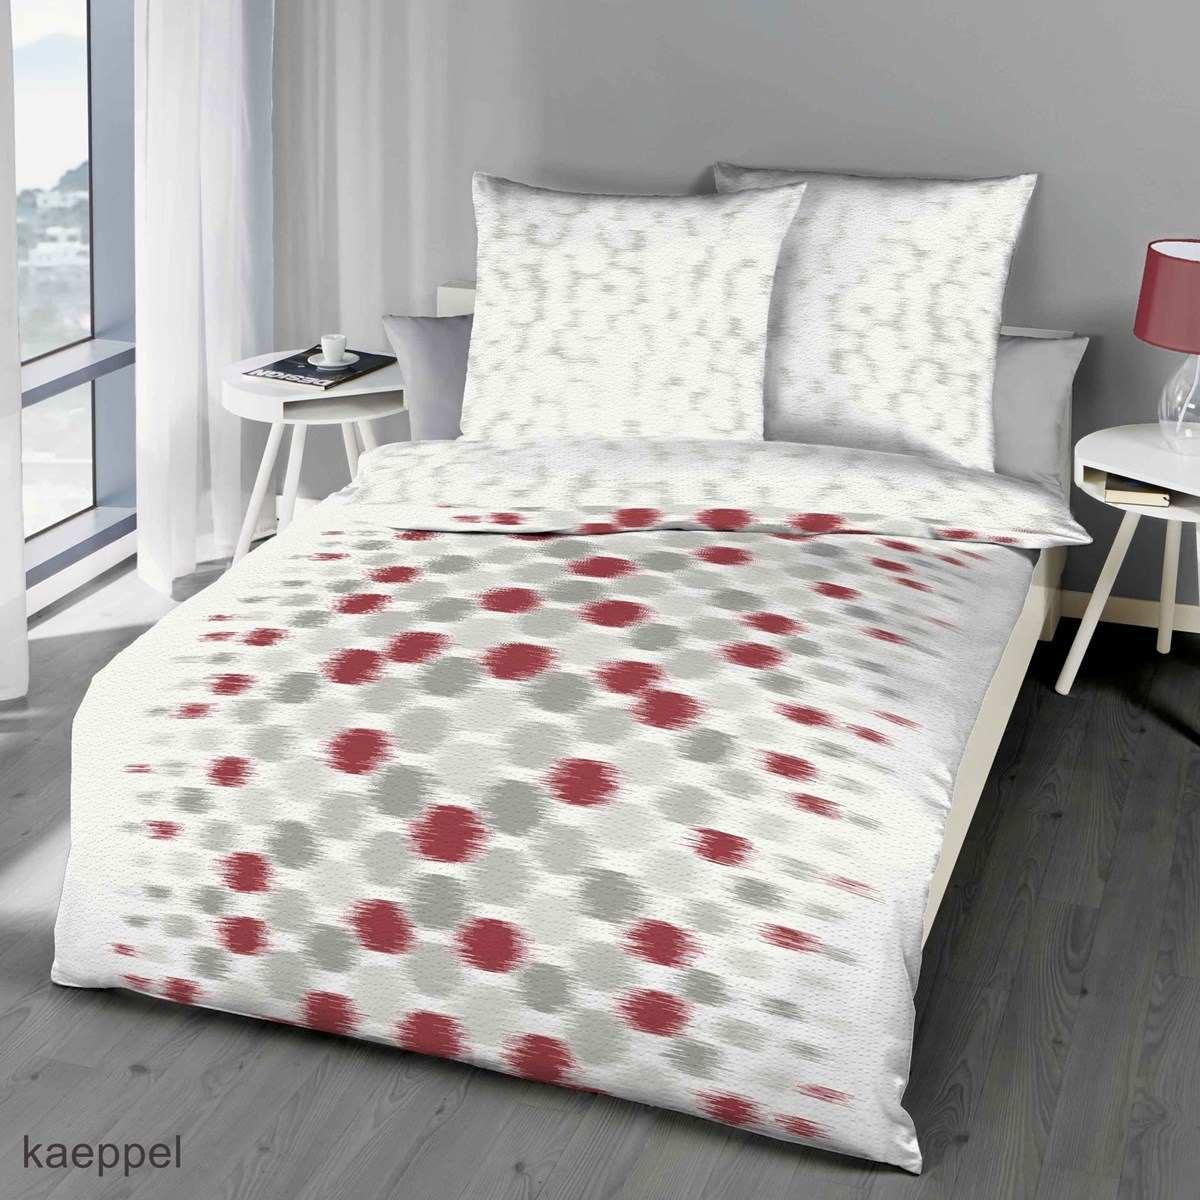 seersucker bettw sche karo kiesel g nstig online kaufen. Black Bedroom Furniture Sets. Home Design Ideas